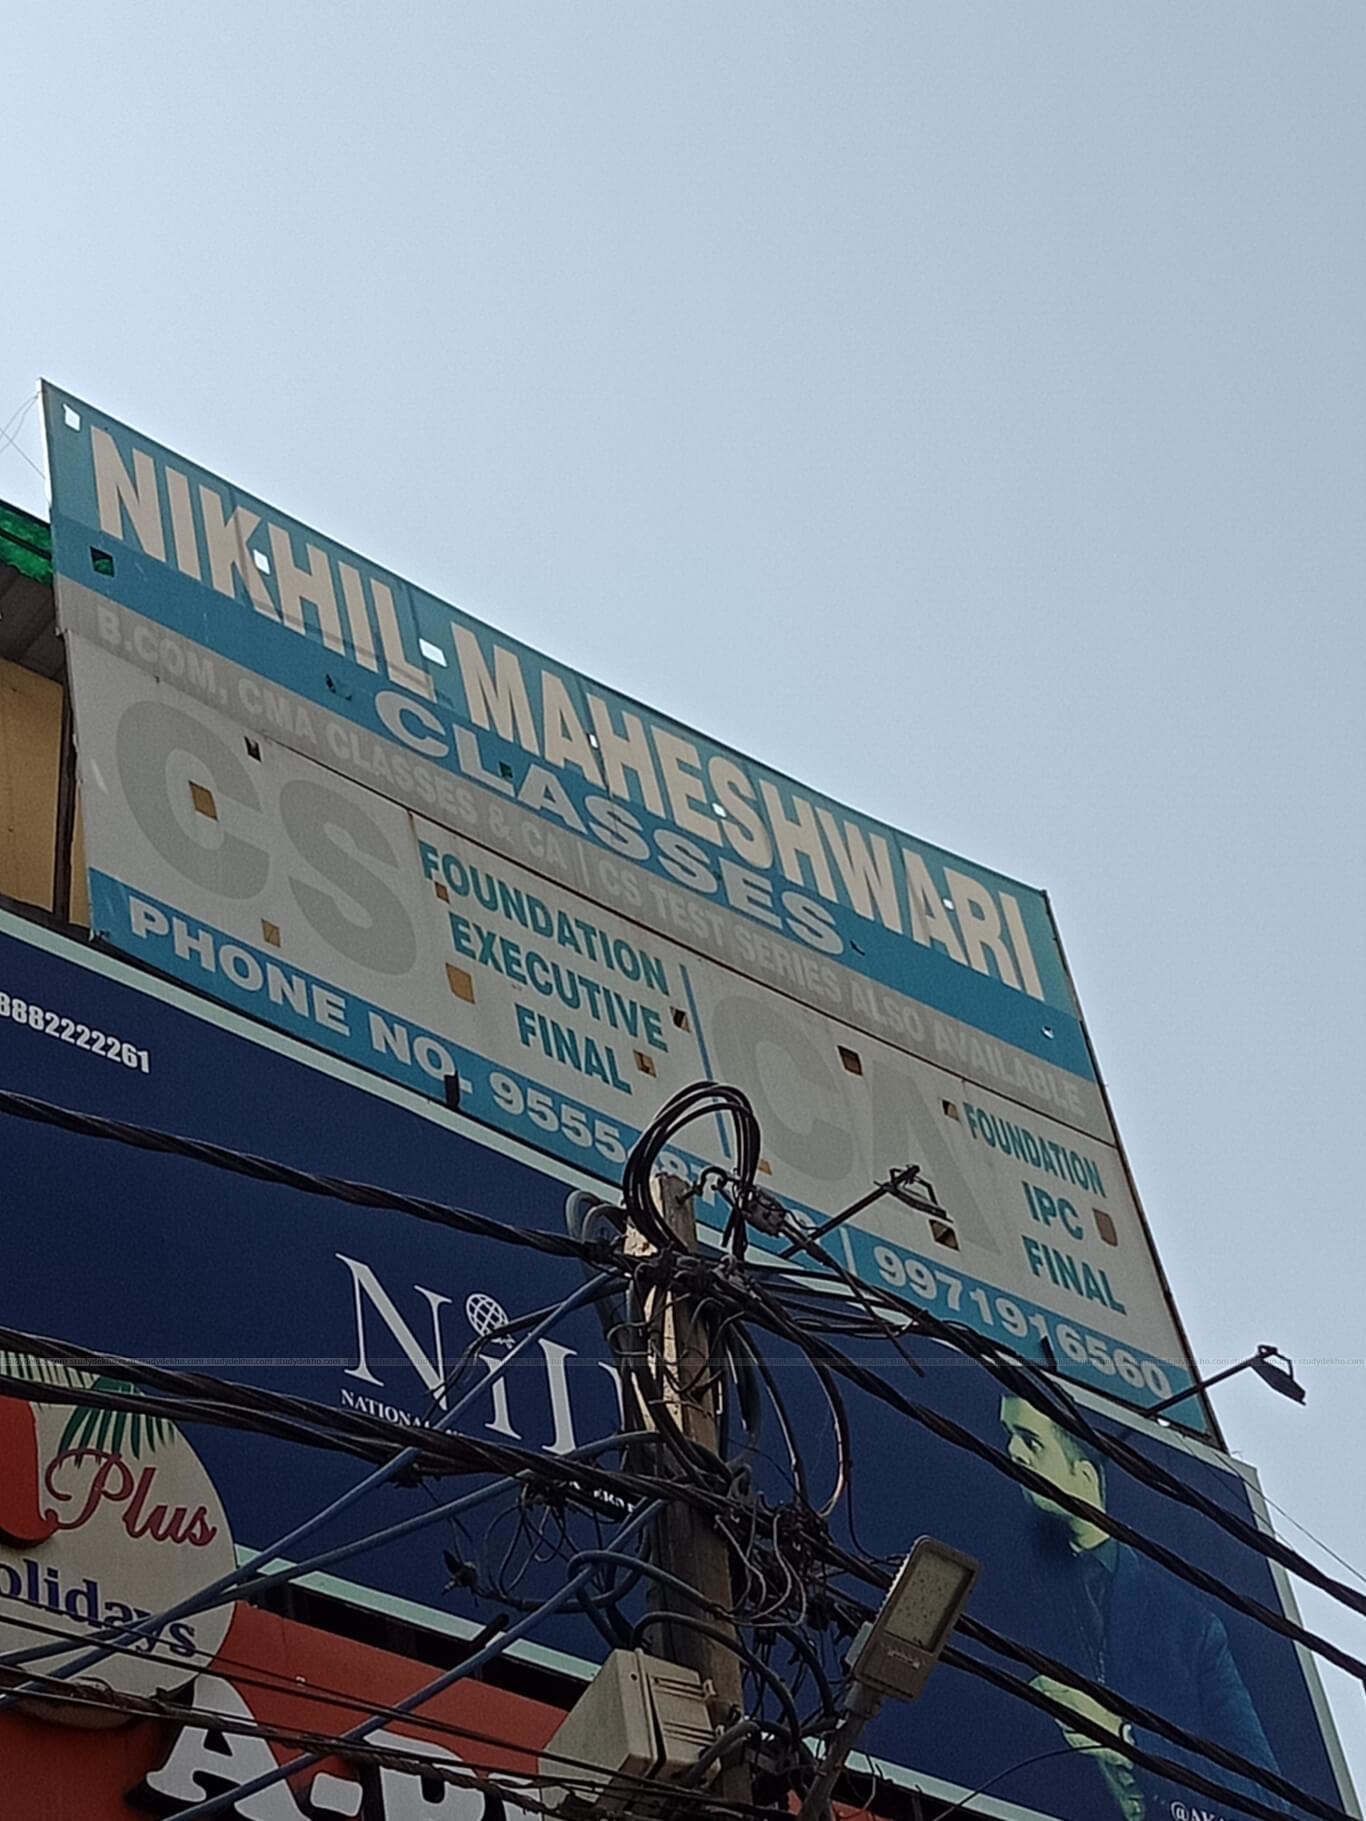 NIKHIL MAHESHWARI CLASSES Logo